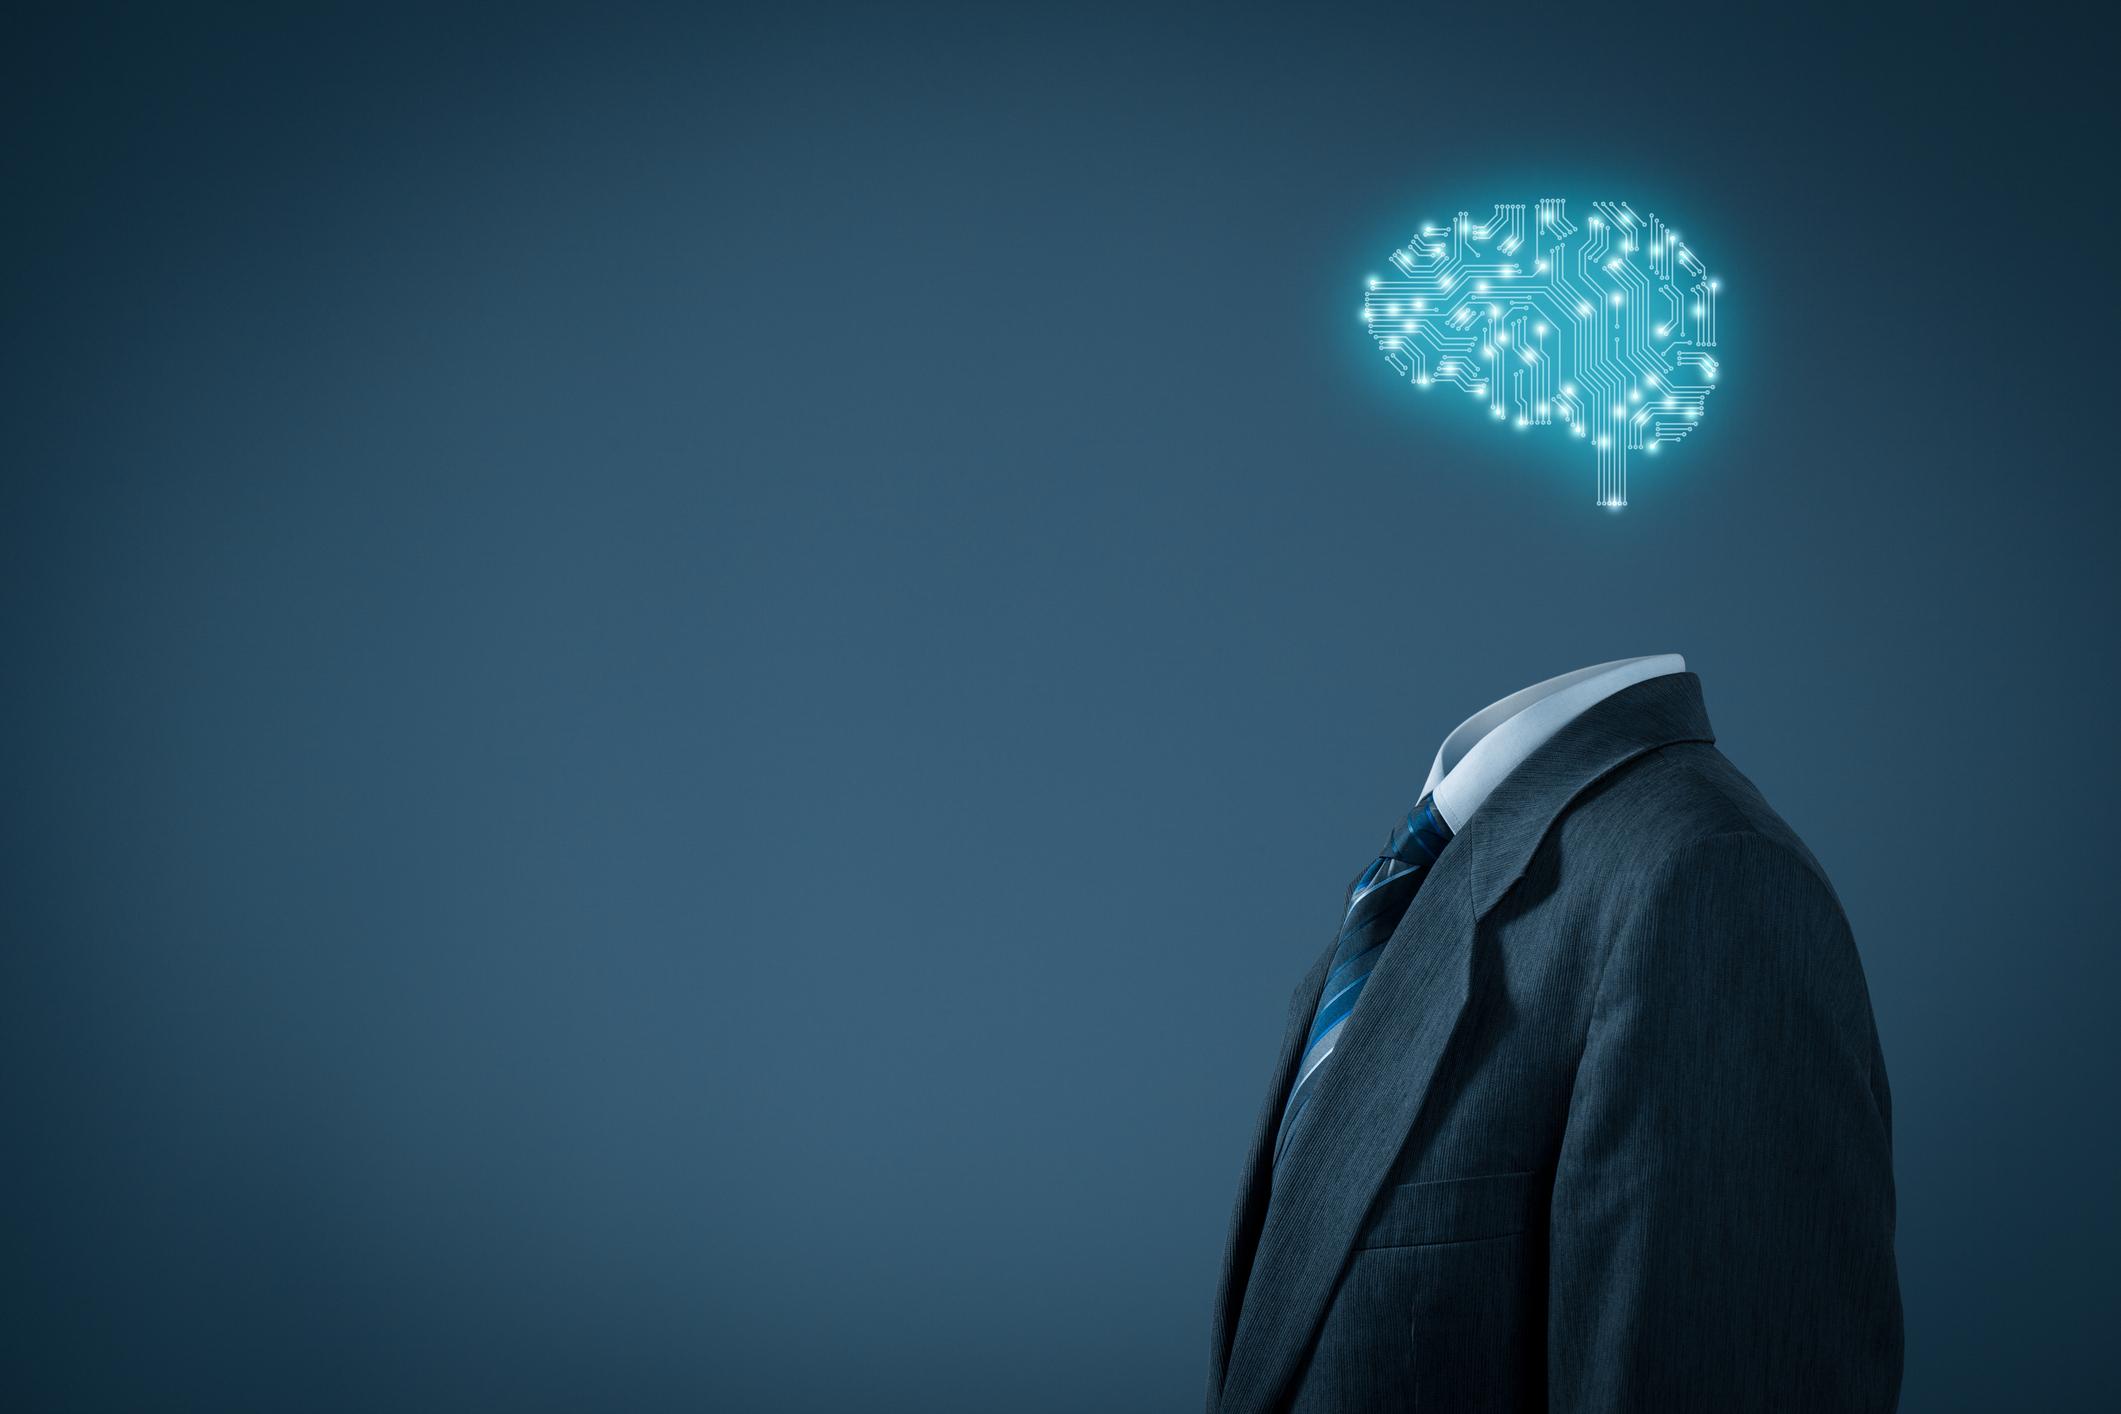 A blue brain, lit up, hovering above a man's business suit